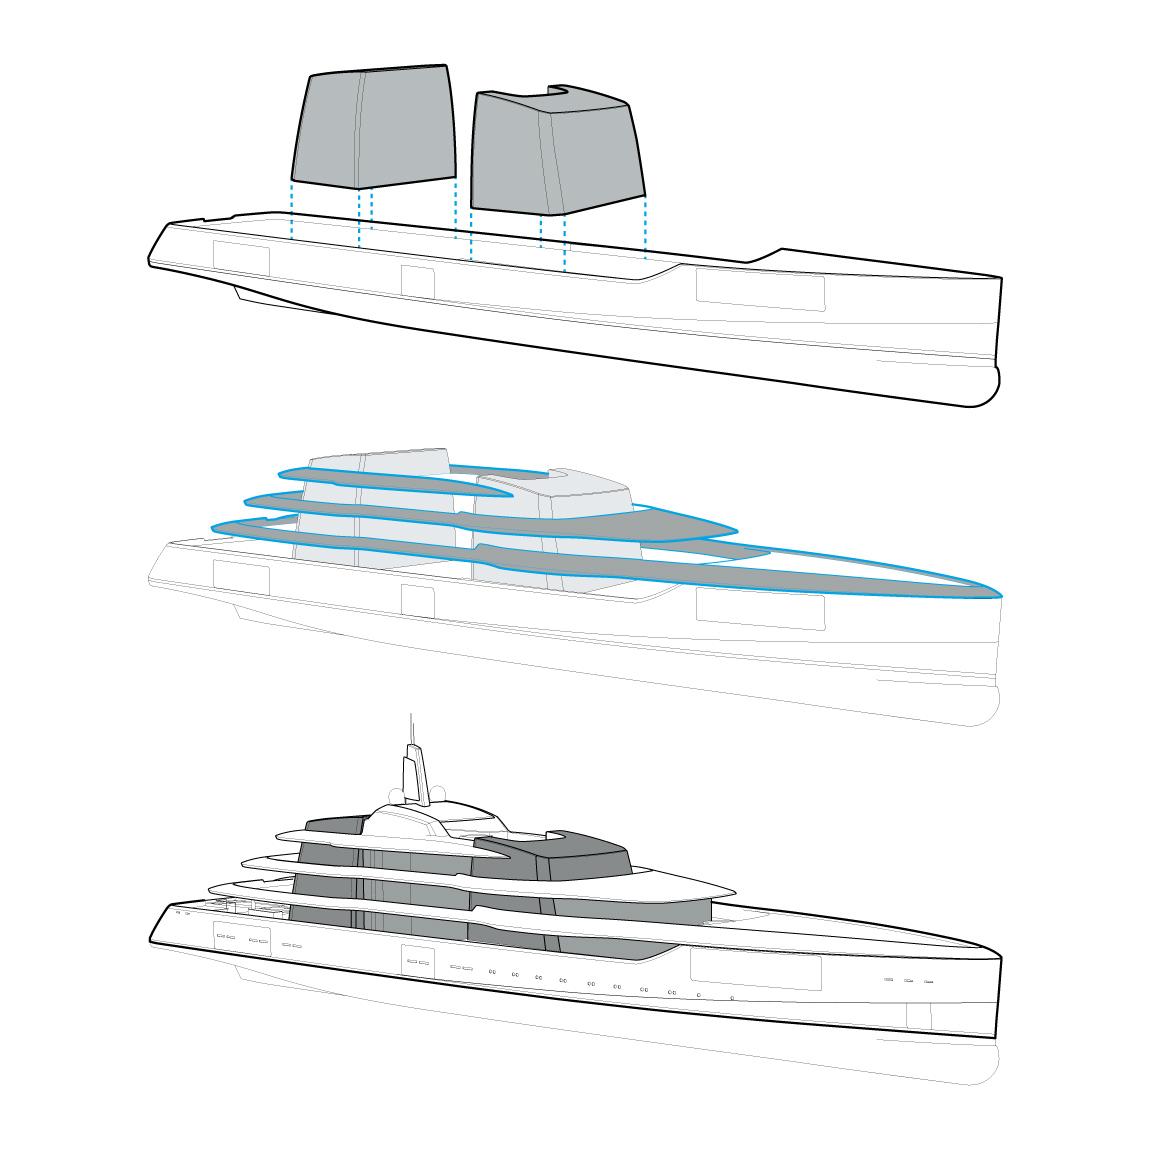 Latest 92m Project Lumen Yacht by Adam Voorhees - Diagram